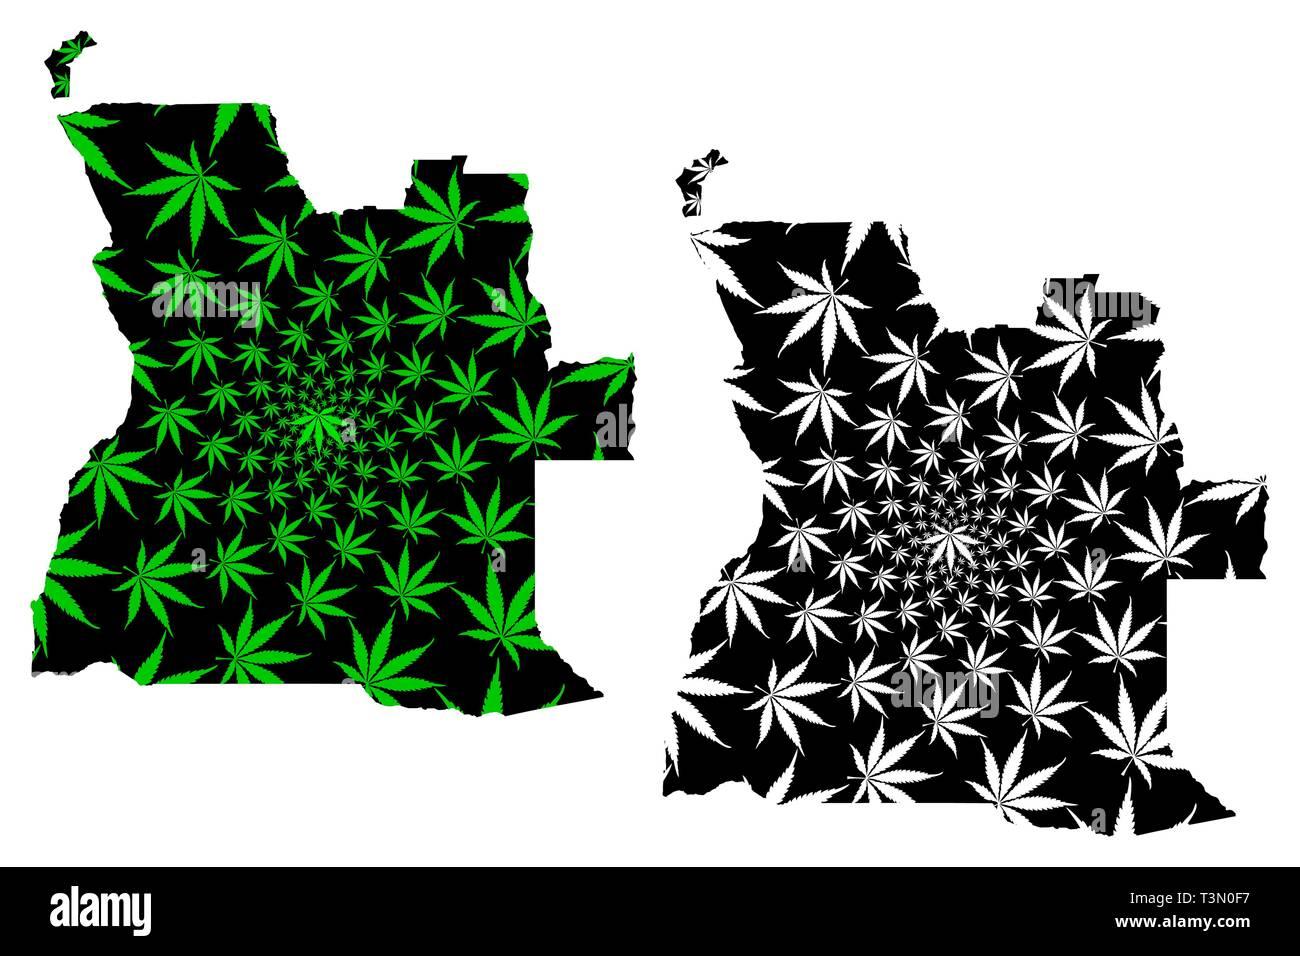 Angola - map is designed cannabis leaf green and black, Republic of Angola map made of marijuana (marihuana,THC) foliage, - Stock Image